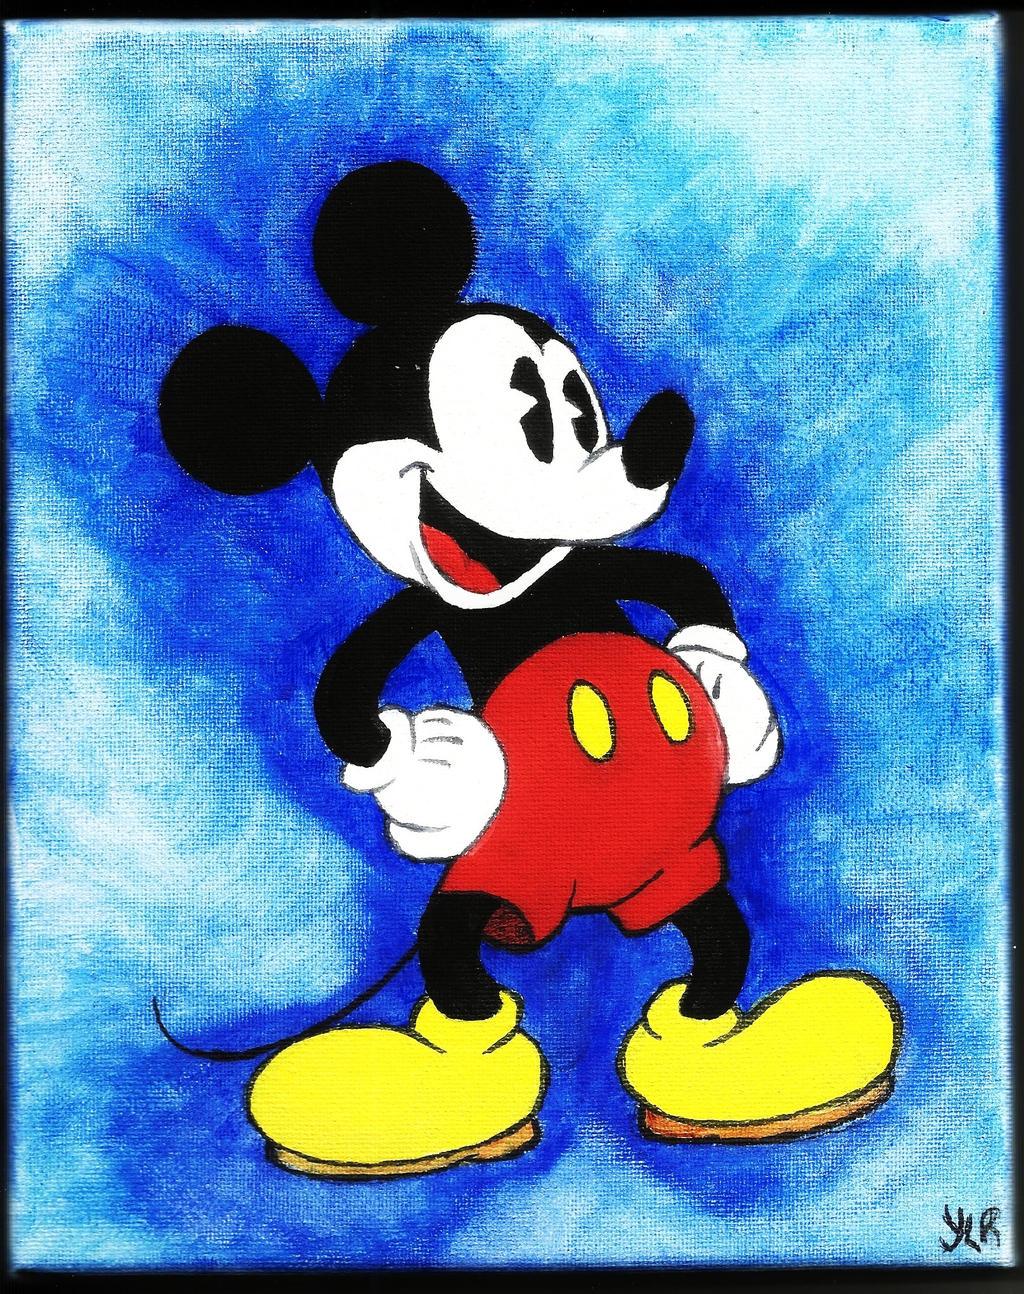 Mickey Mouse Painting by VerseaPetrova on DeviantArt